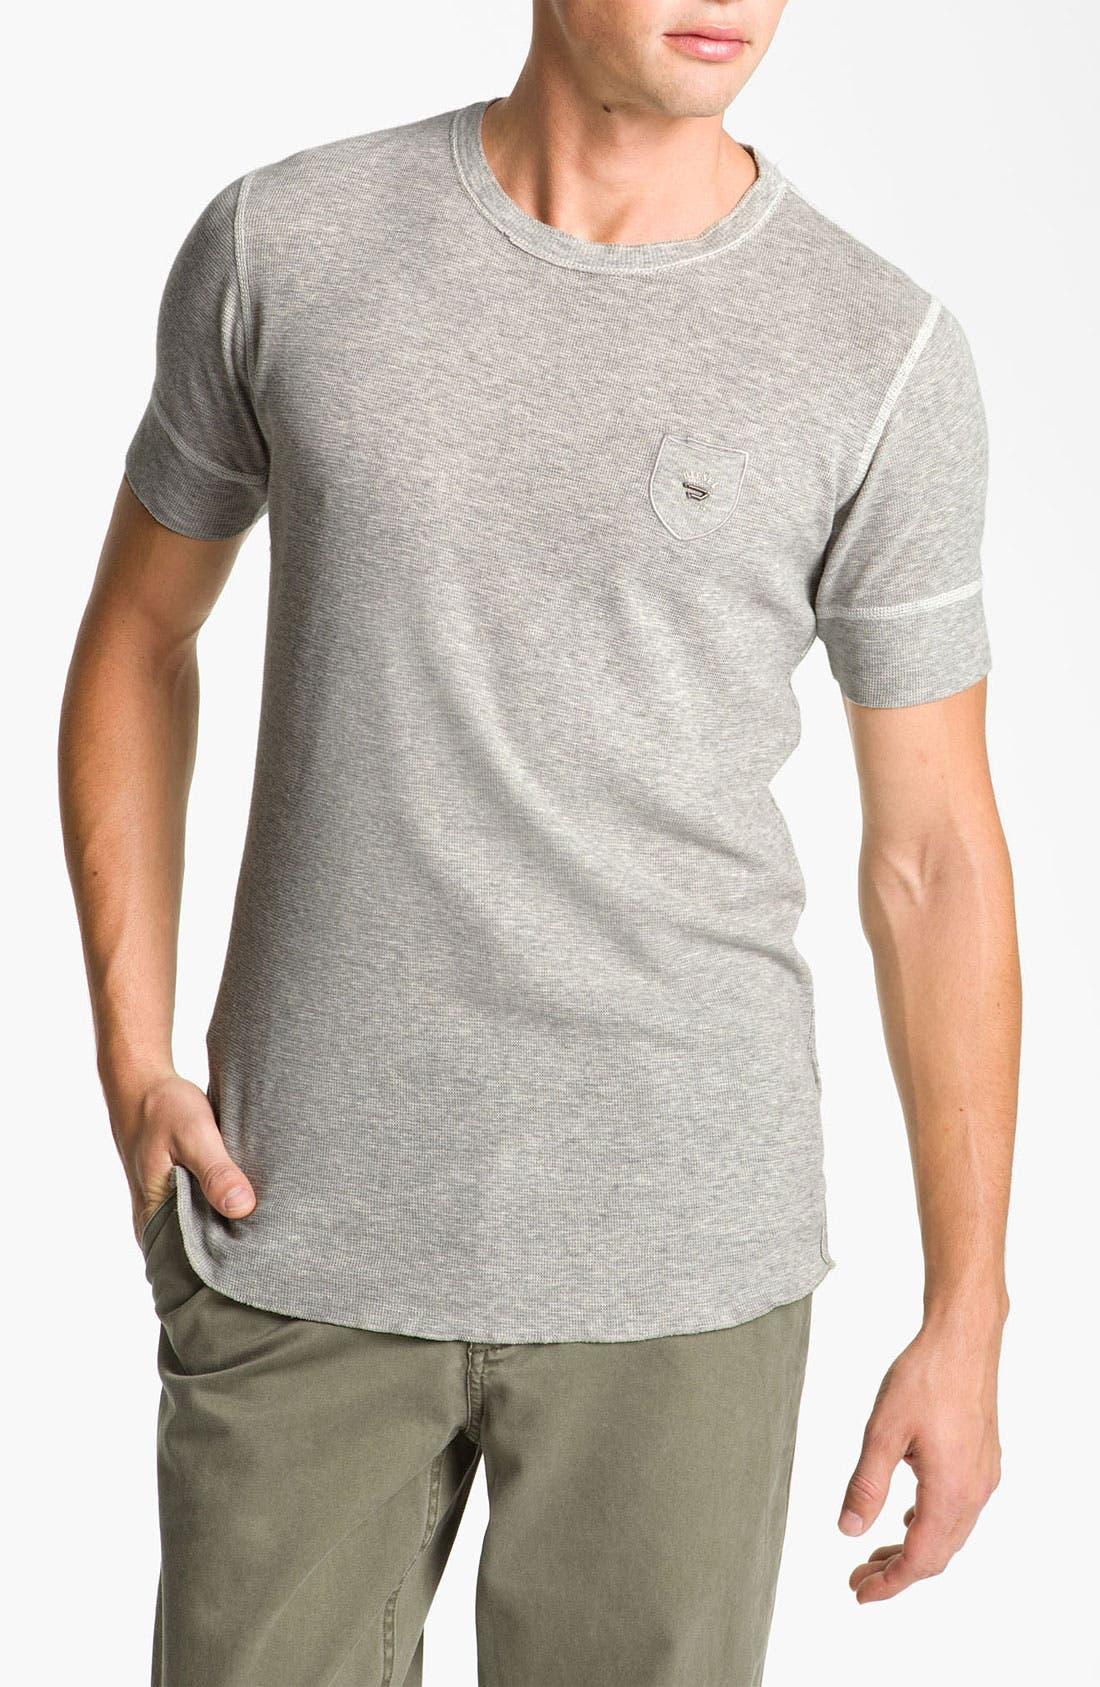 Main Image - DIESEL® Waffle Knit Thermal T-Shirt